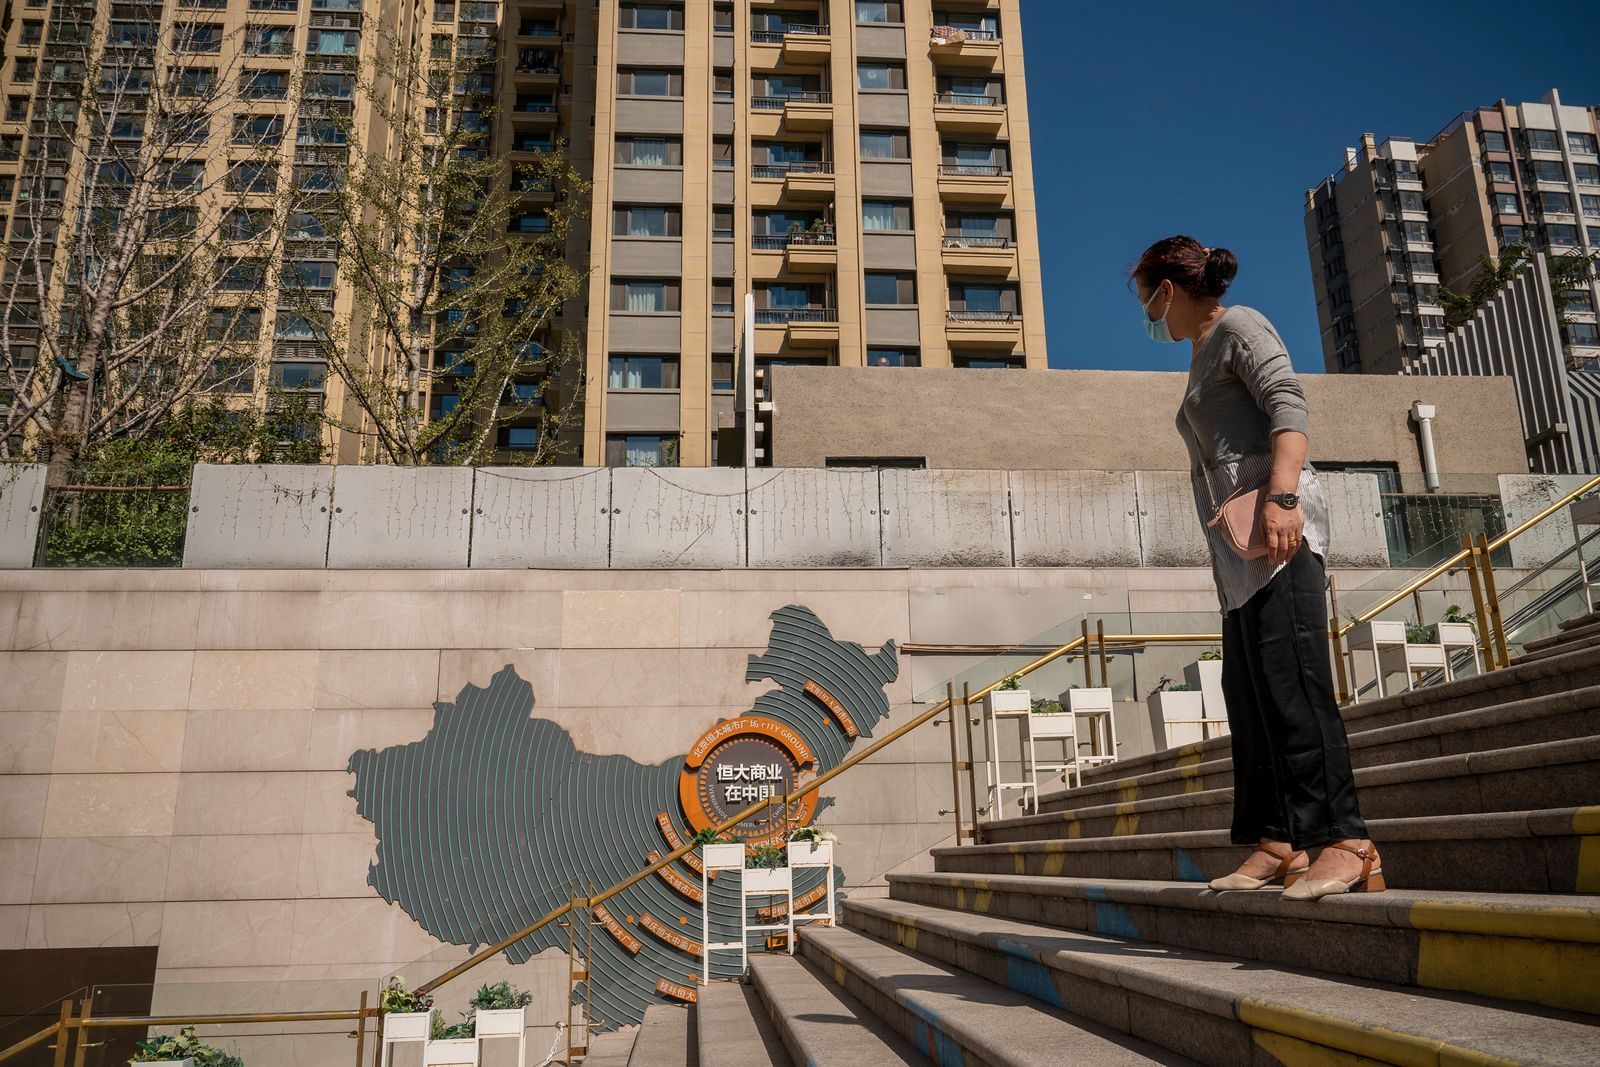 China's Evergrande Crisis Shakes Global Stock Markets